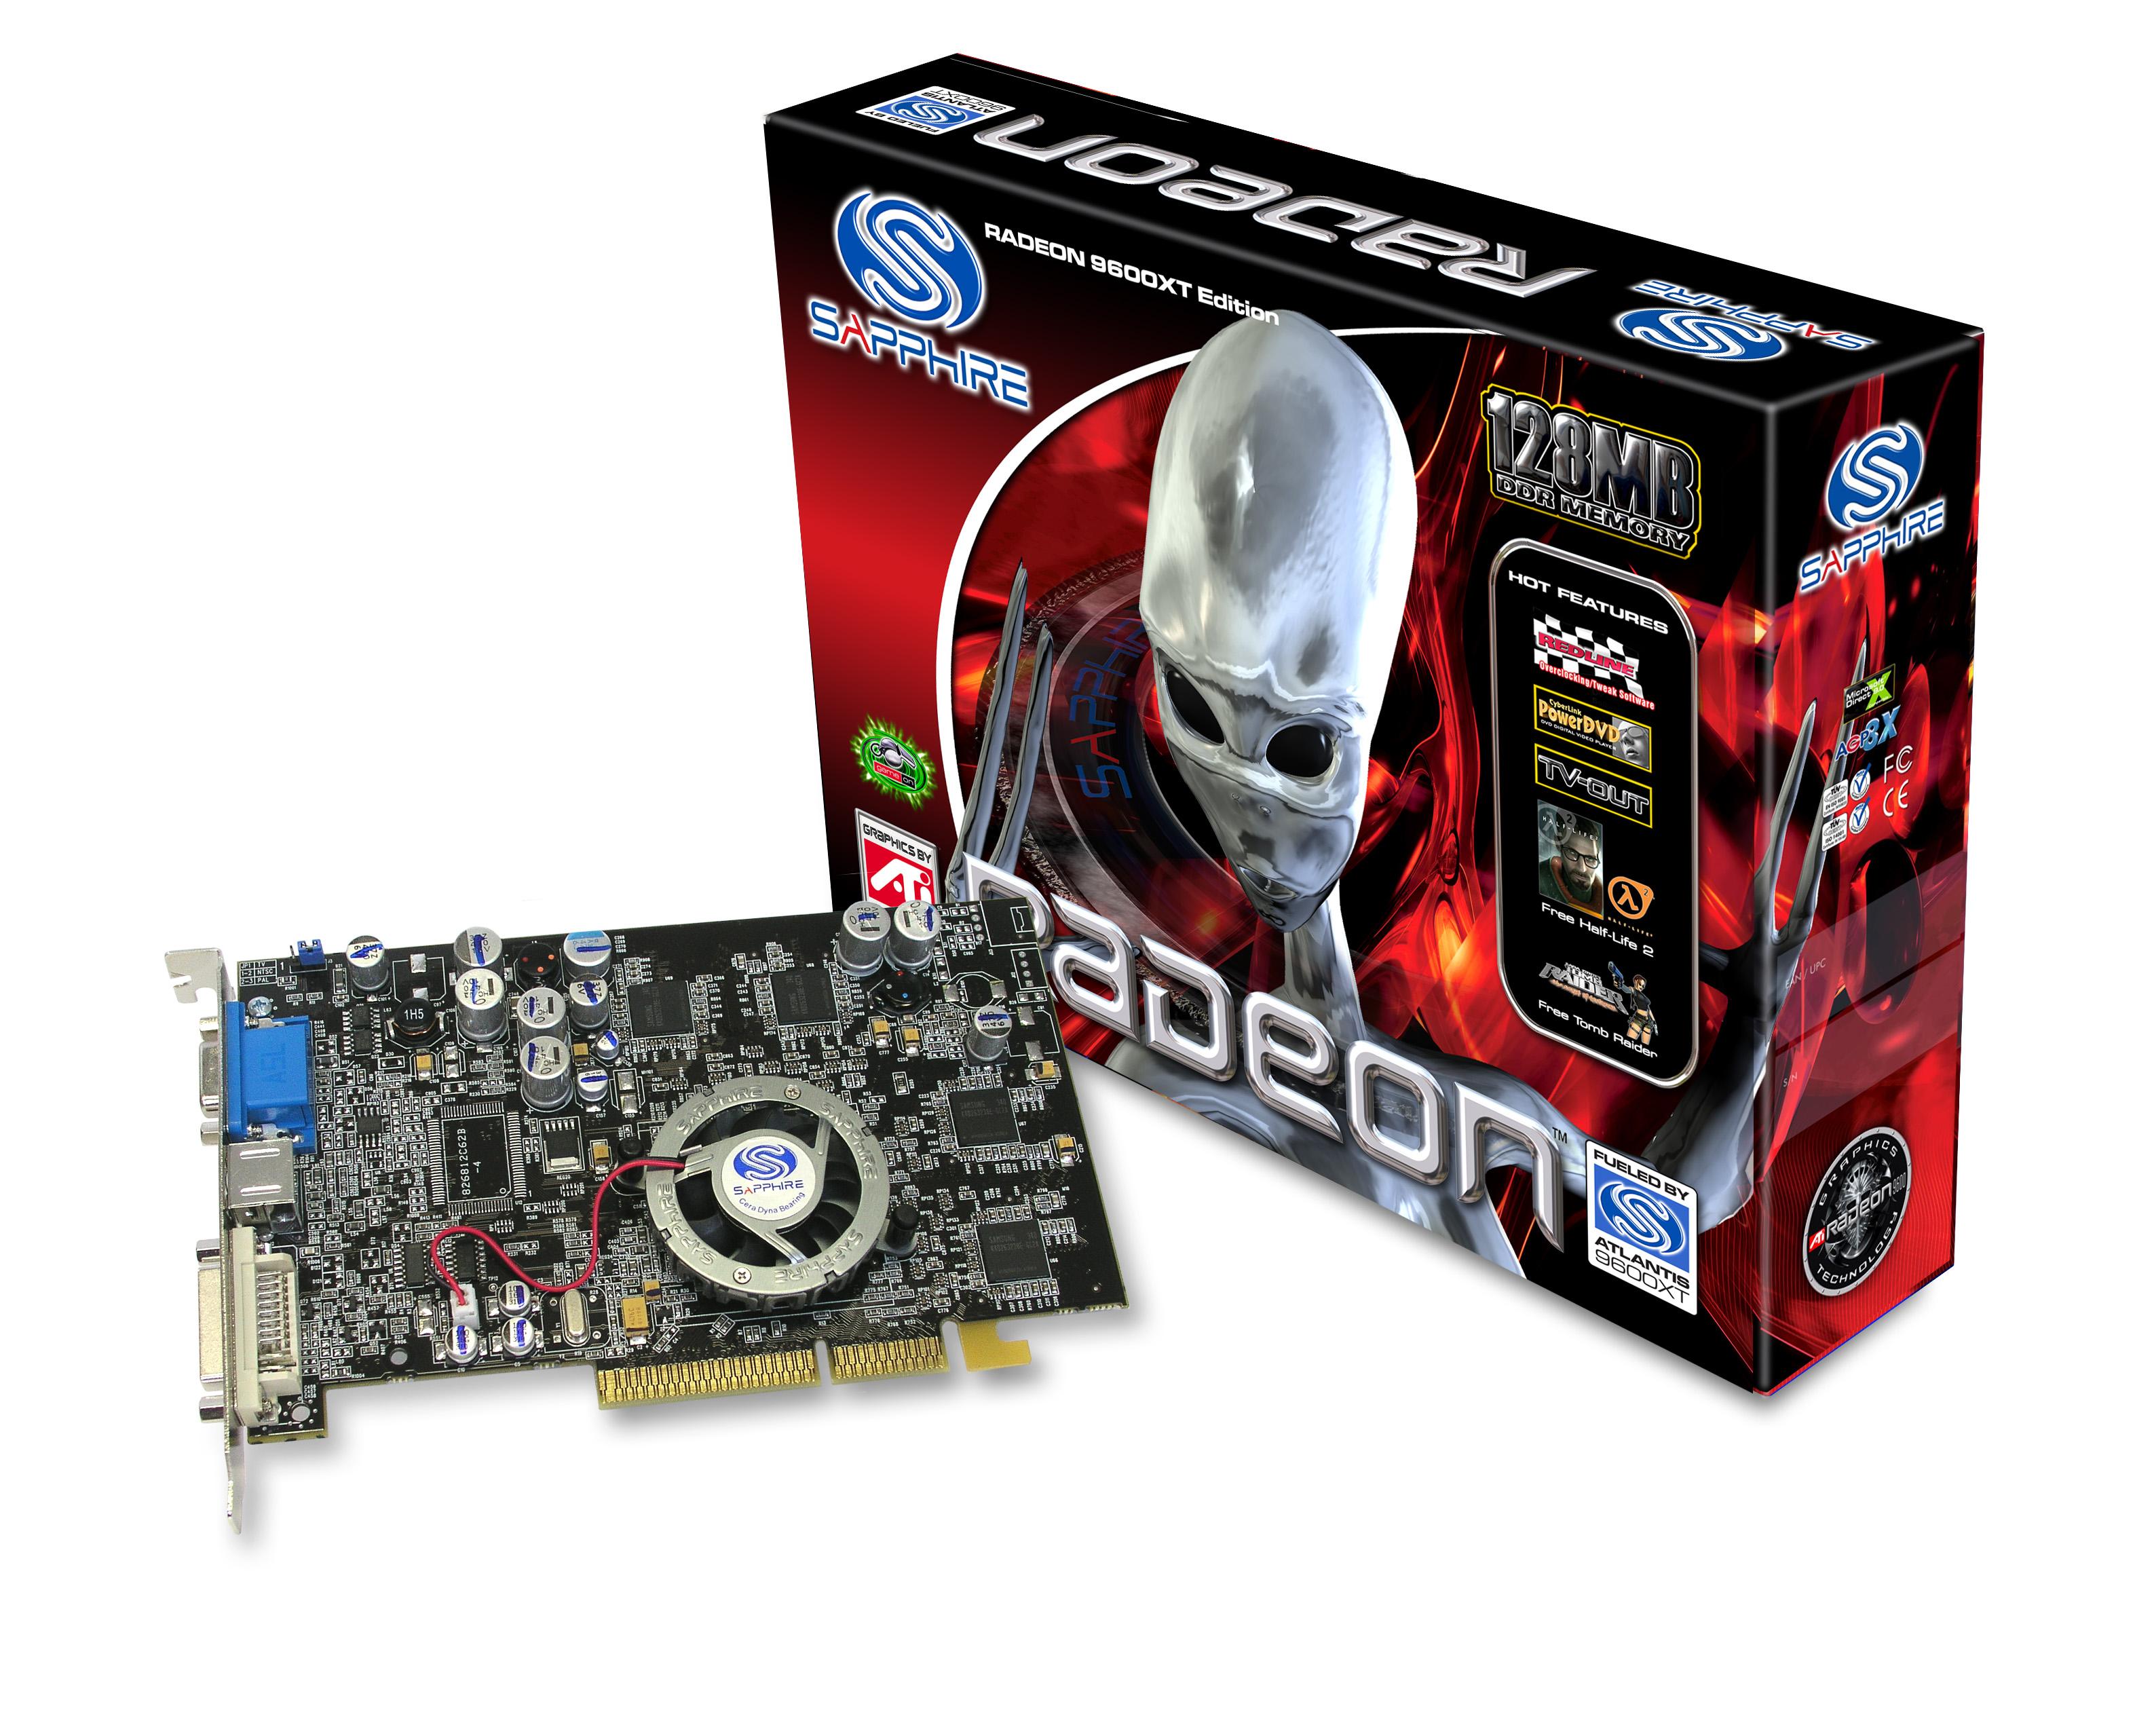 SAPPHIRE RADEON X300SE - driver downloads